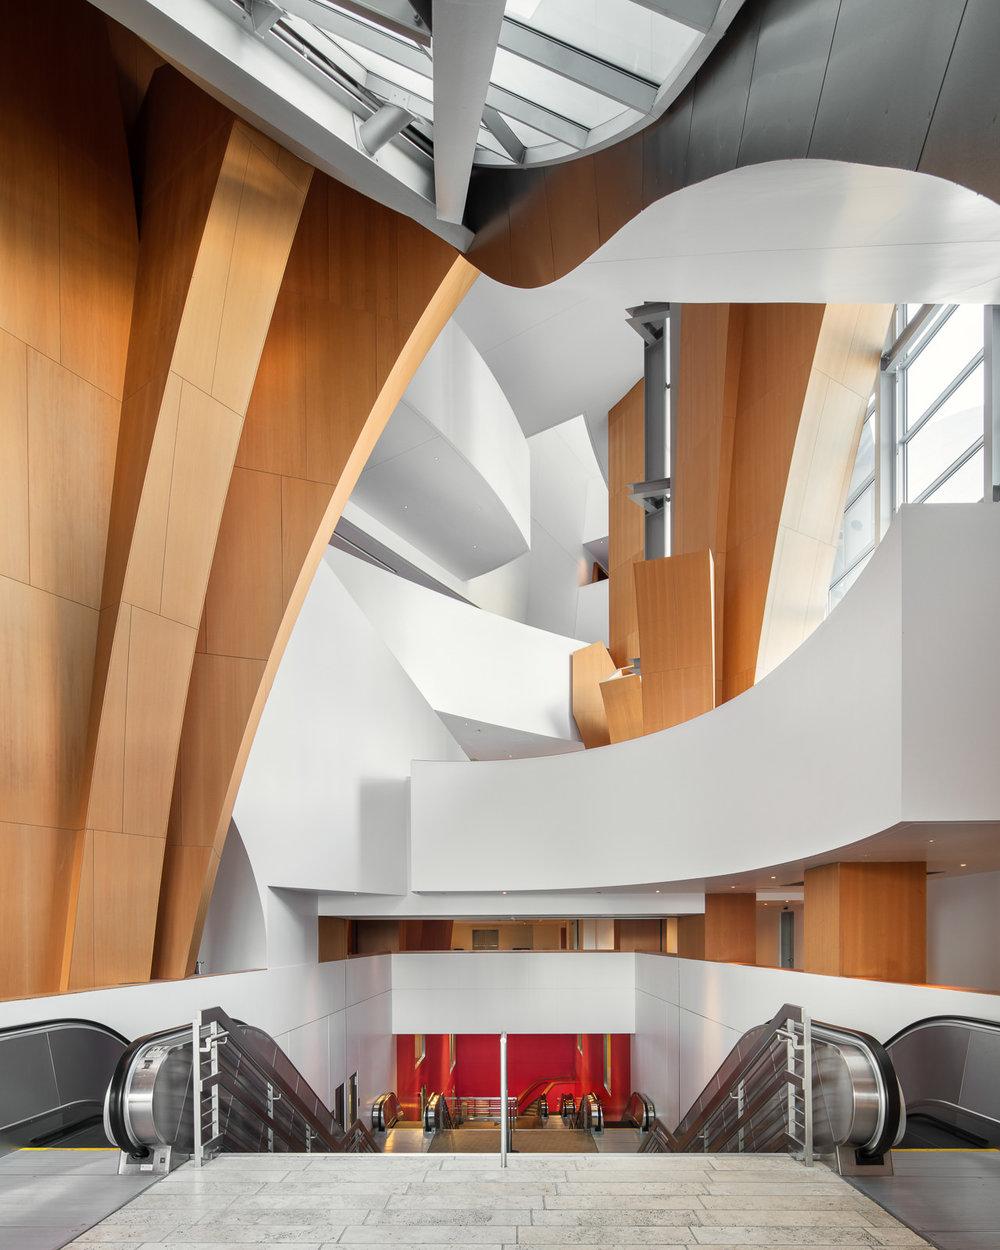 Walt Disney Concert Hall, Los Angeles, CA - Frank Gehry